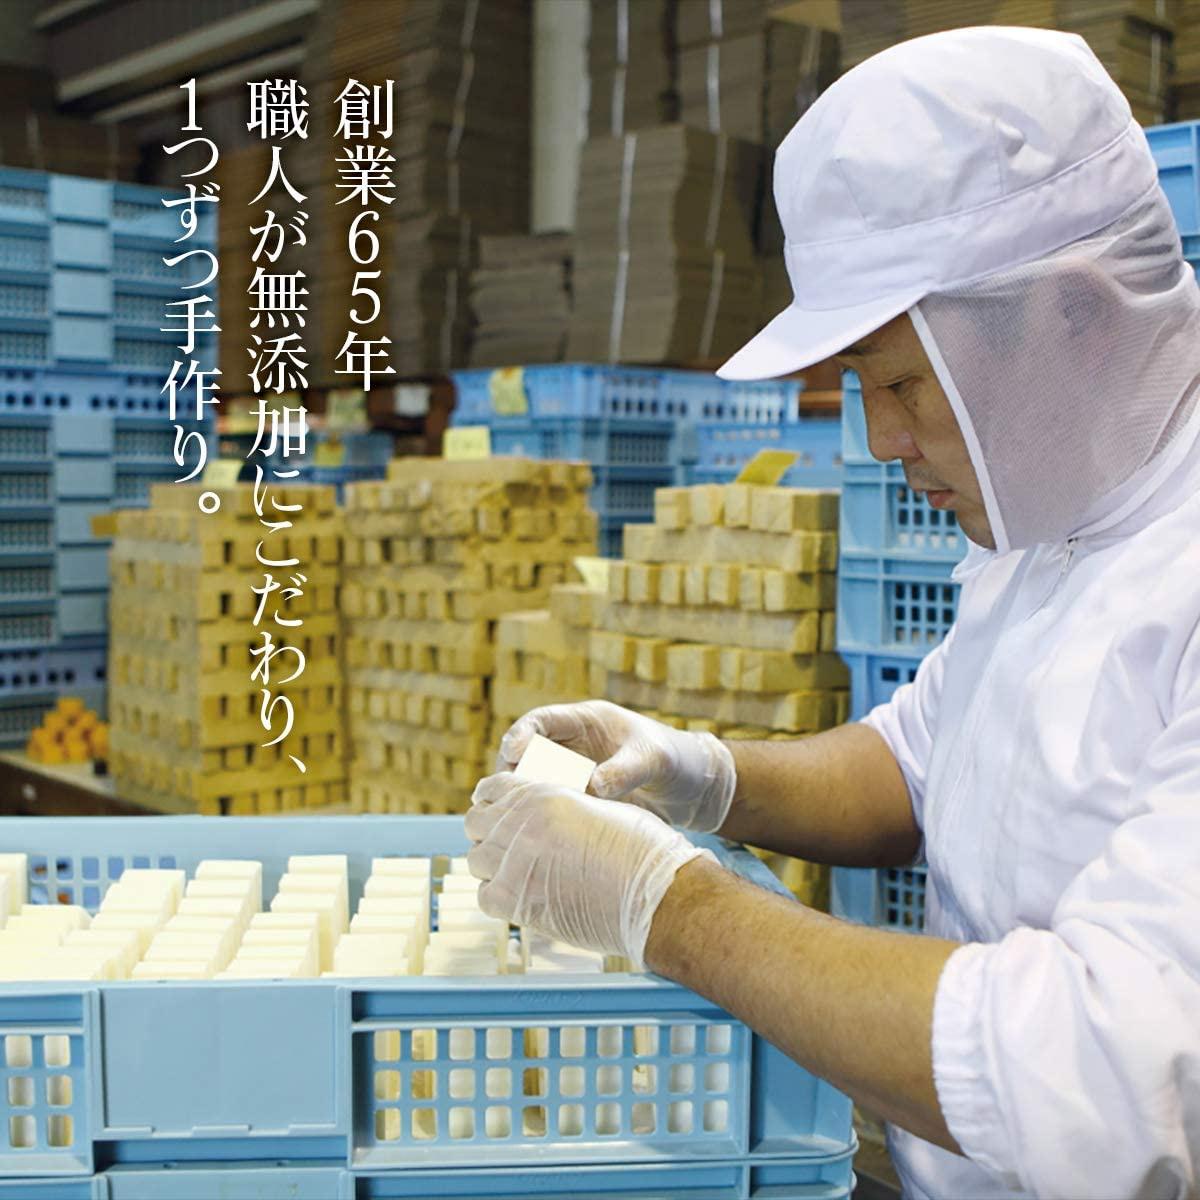 西陣石鹸(NISHIJIN SOAP) 洗顔用石鹸の商品画像6